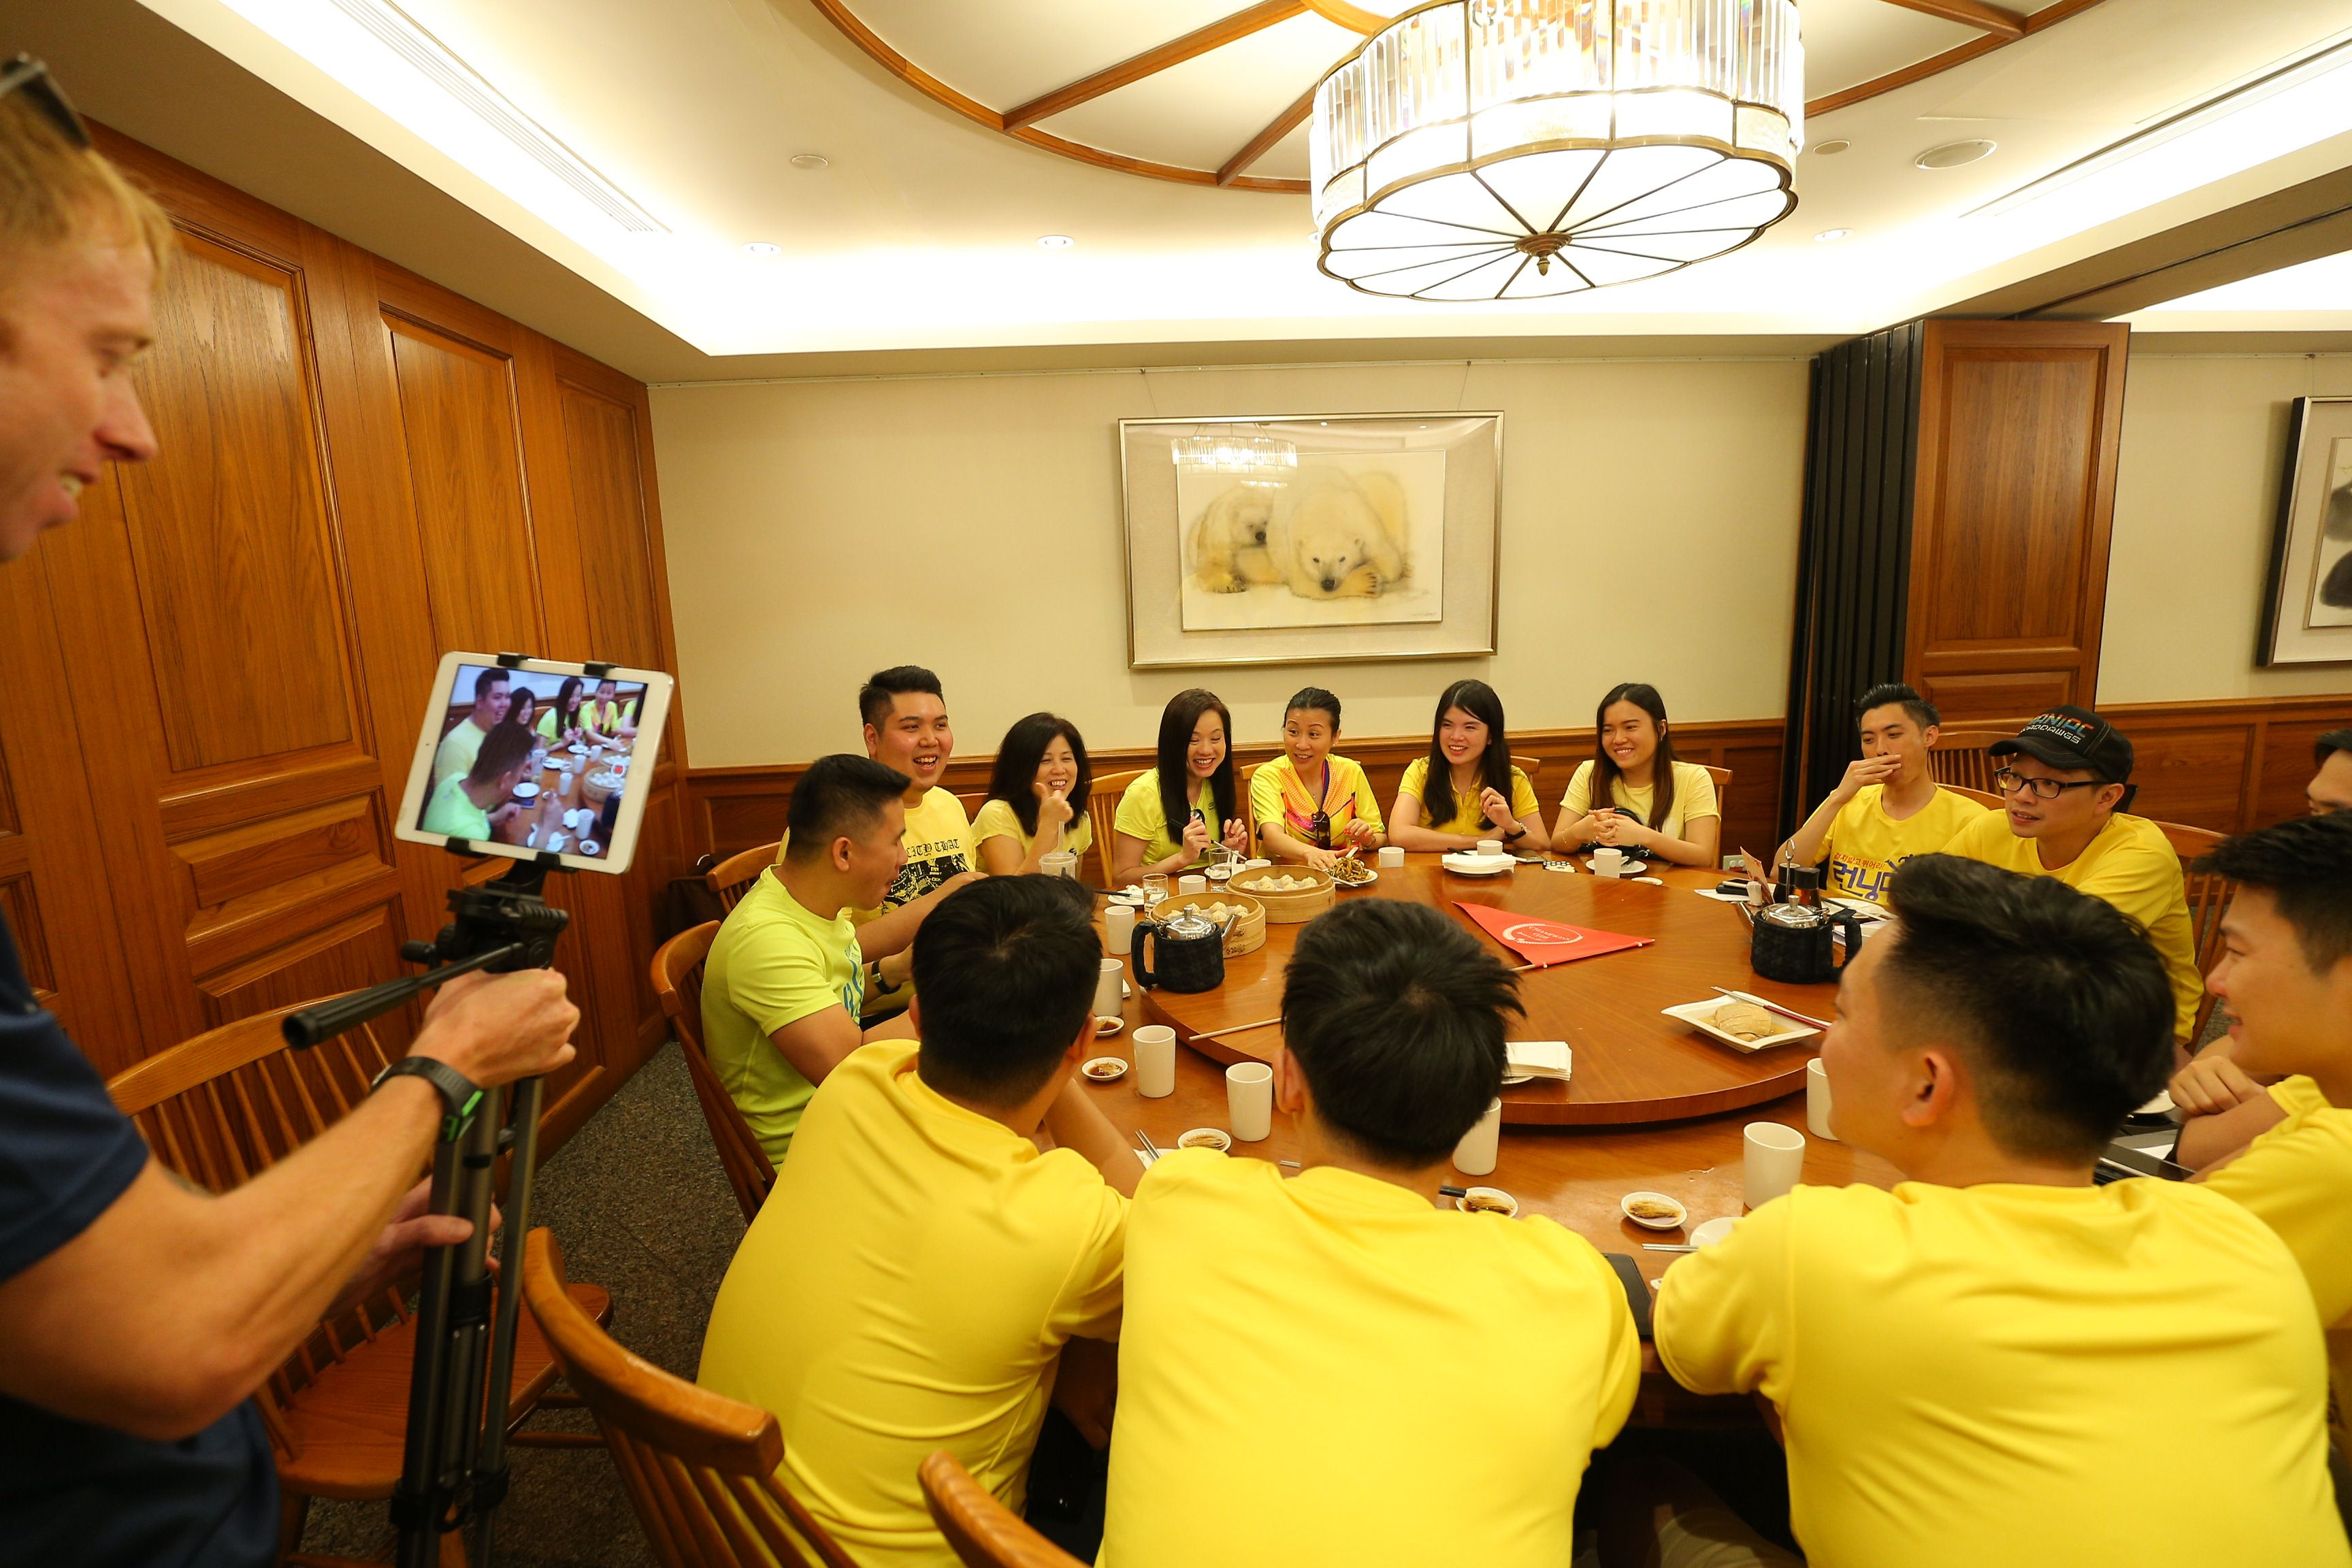 Blog of Team Building and Company Retreats